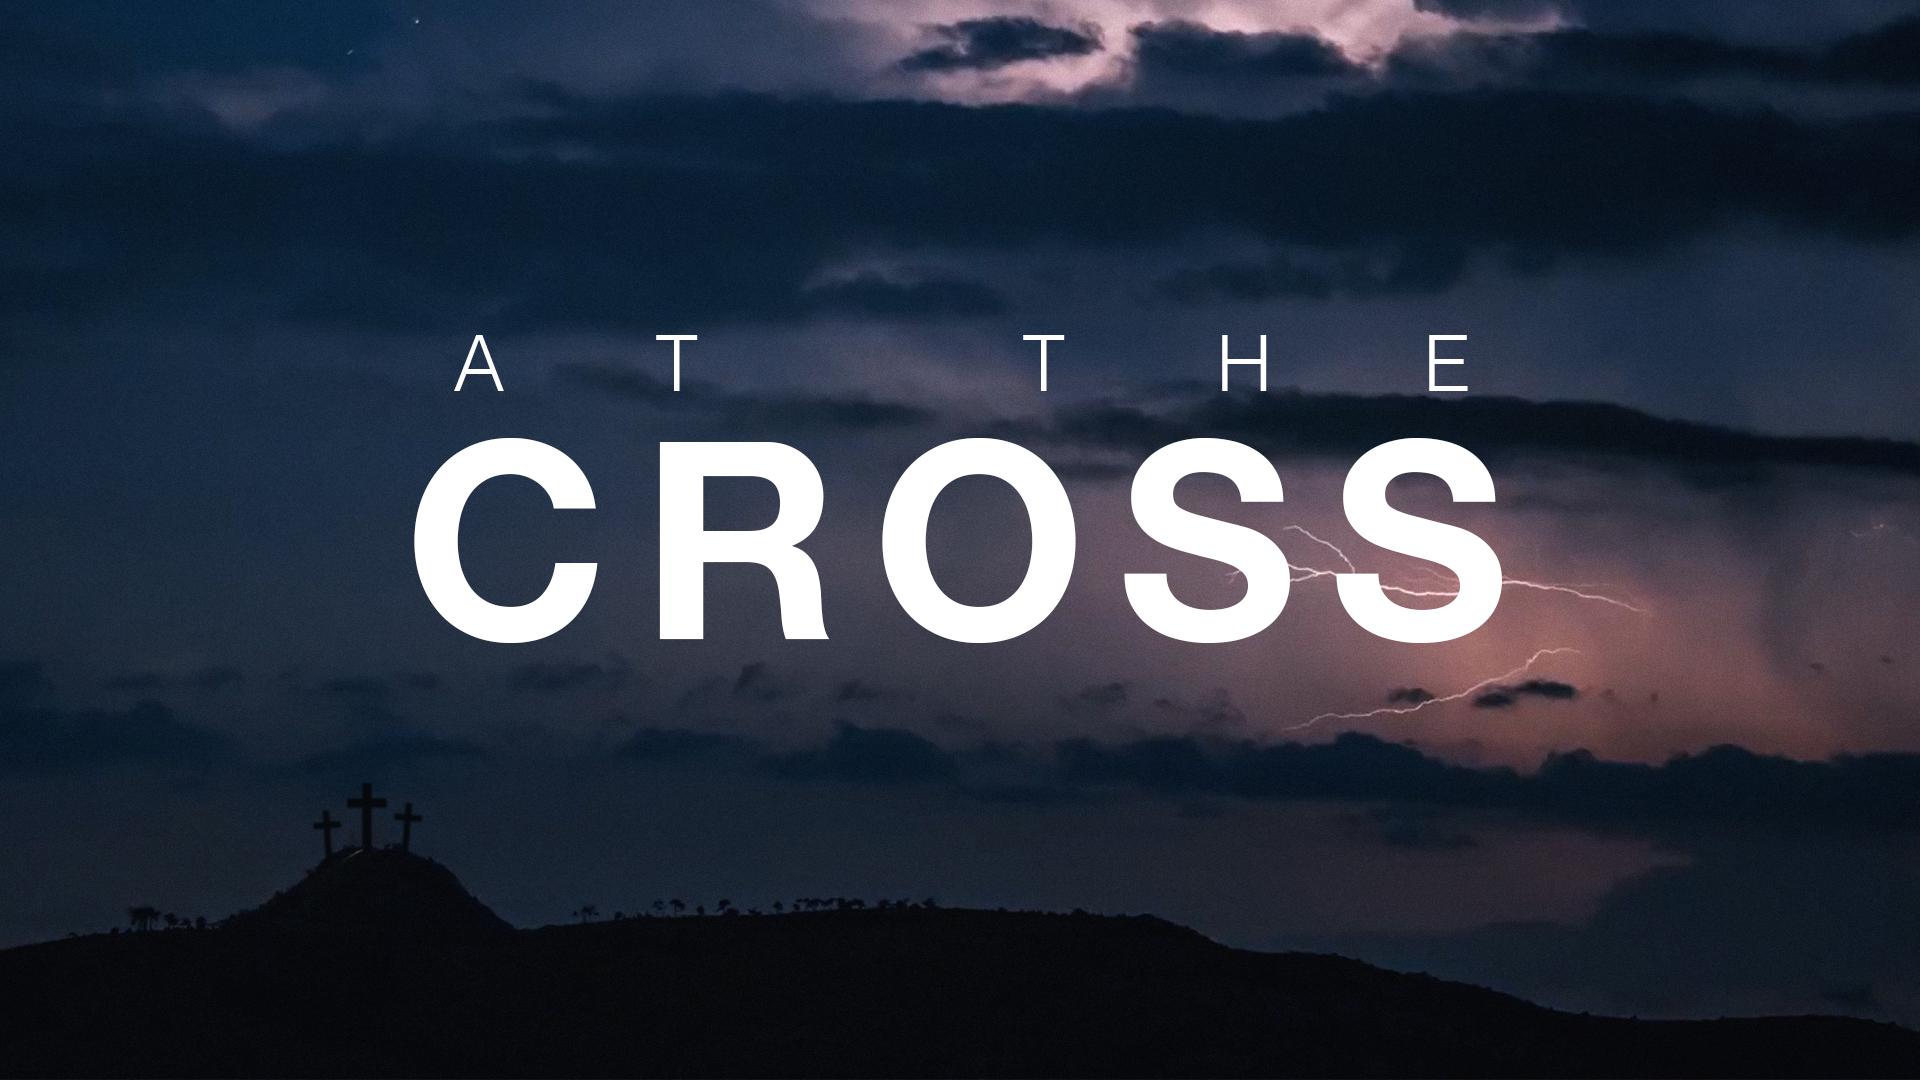 At The Cross_Master.jpg